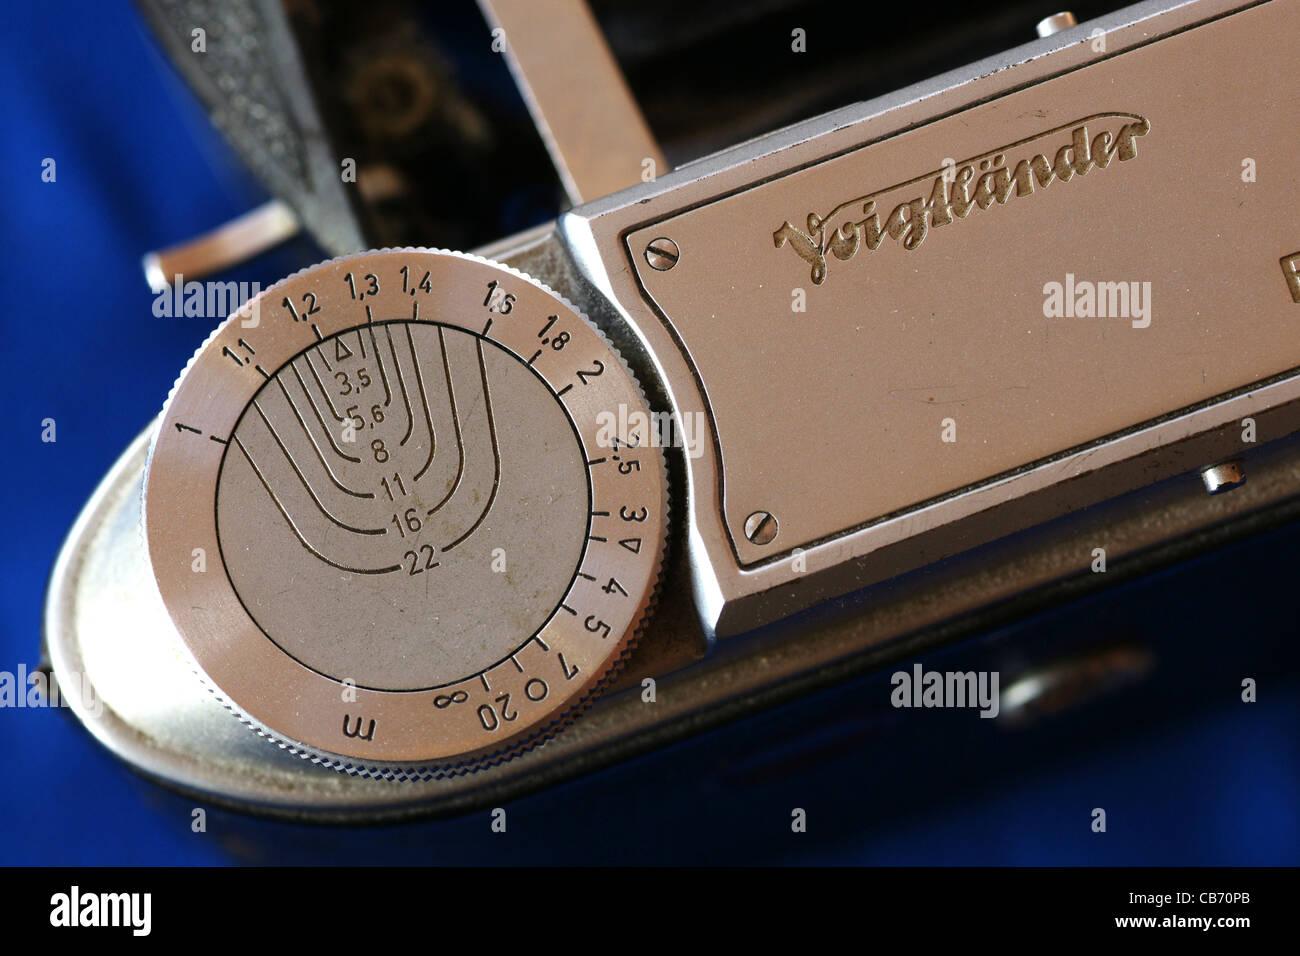 A Vintage Voigtlander Bessa Ii Folding Bellows Camera ... Pictures Made With Voigtlander